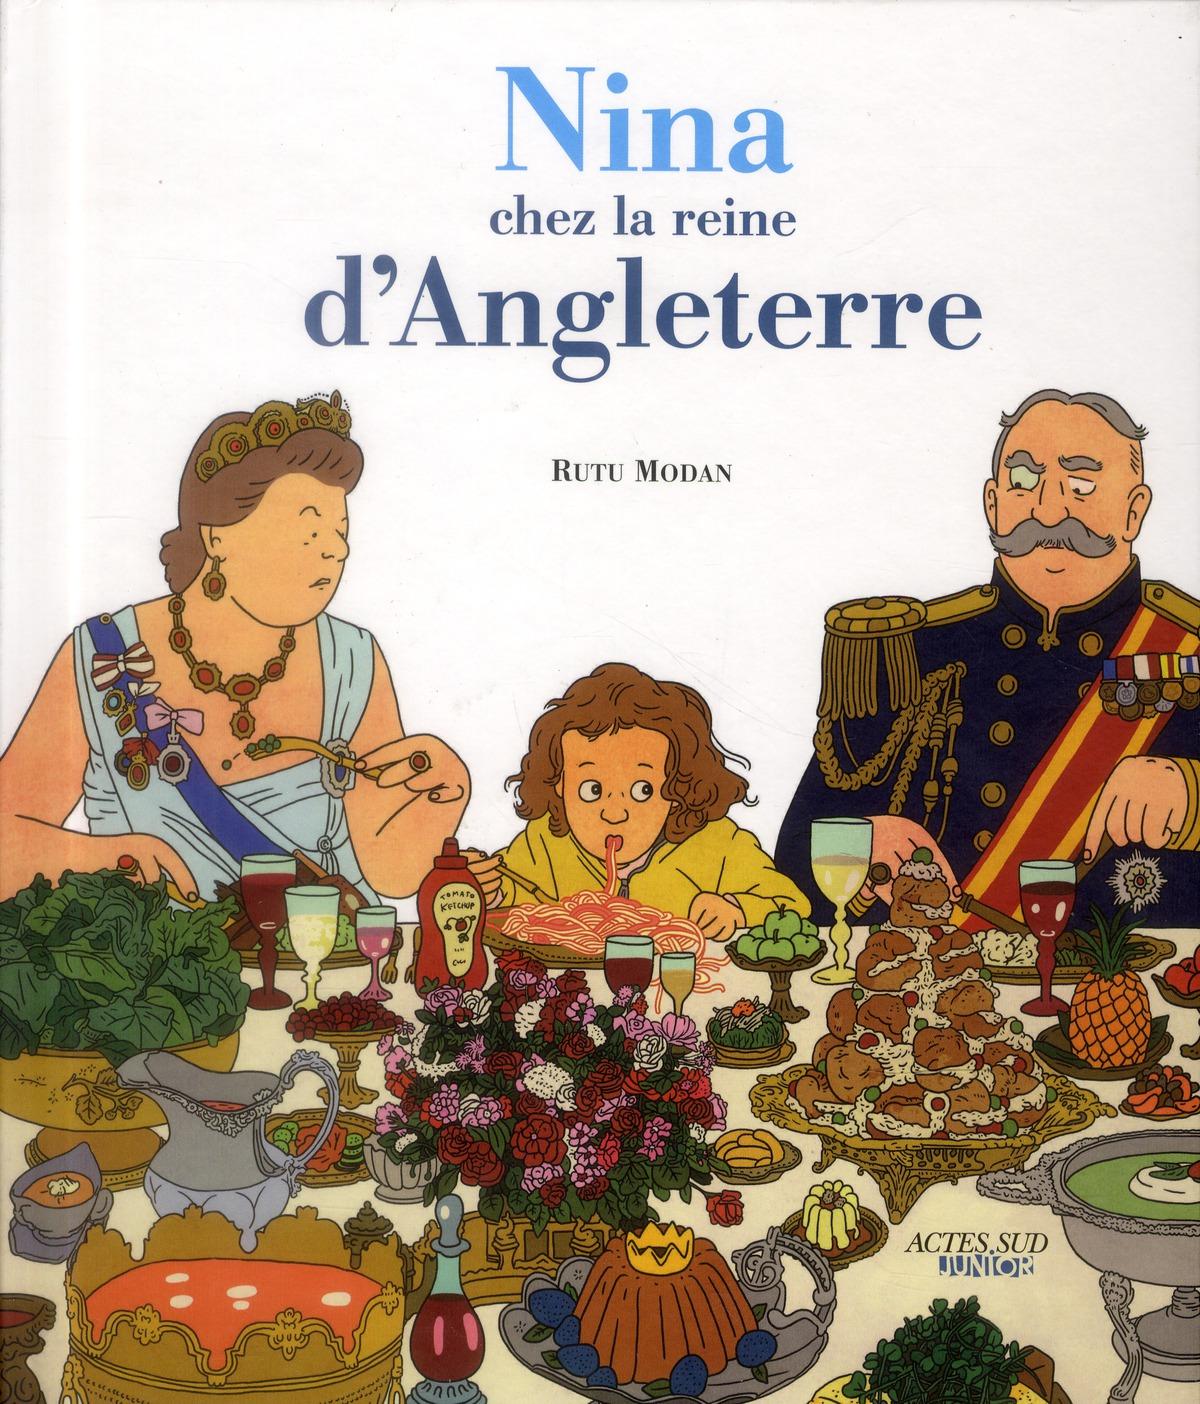 Nina Chez La Reine D'Angleterre